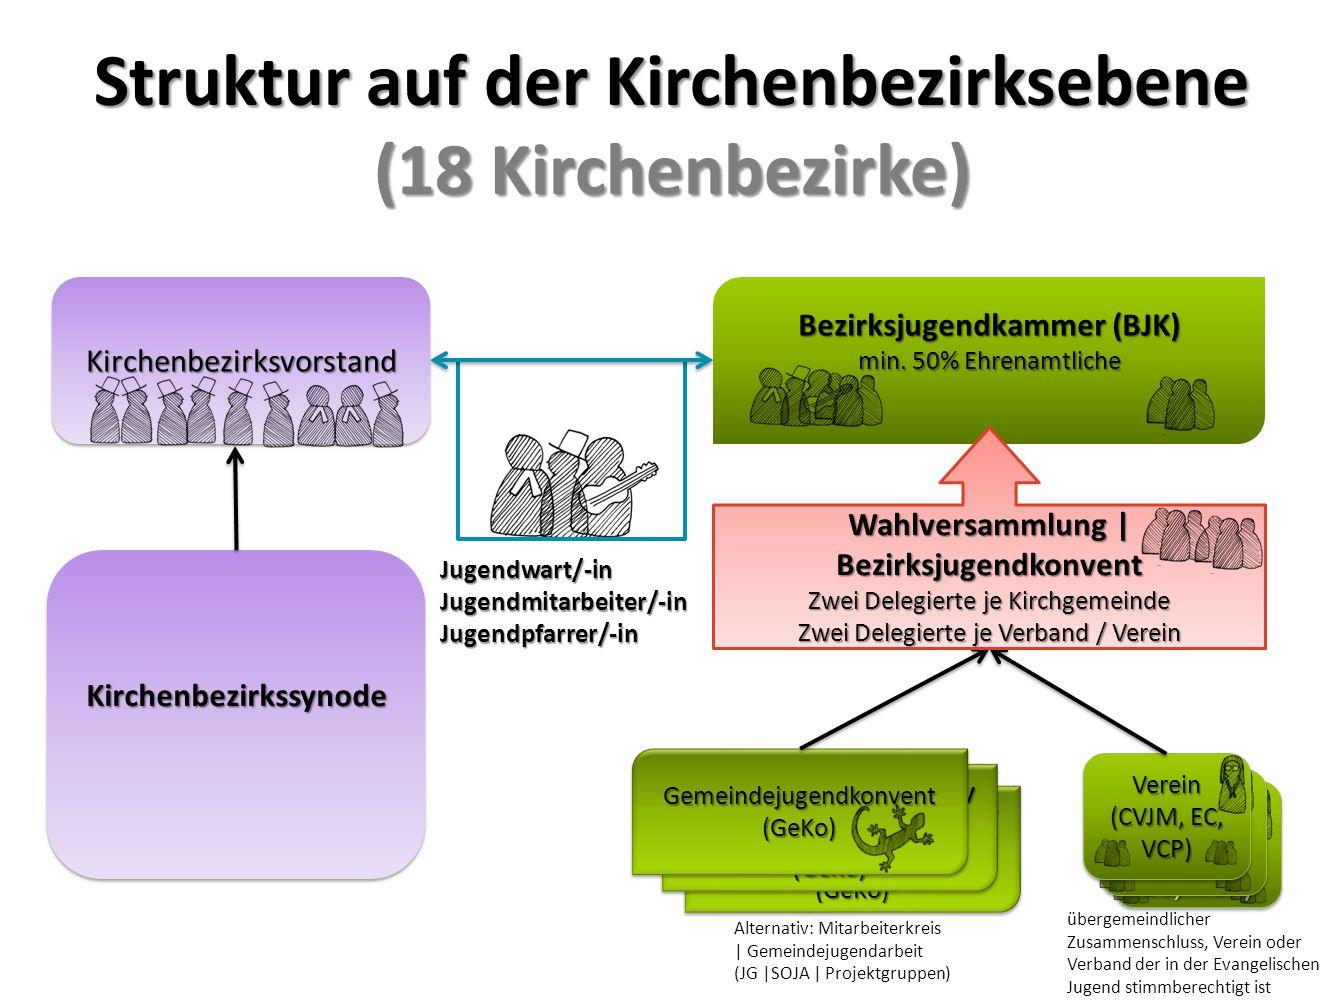 Struktur auf der Kirchenbezirksebene (18 Kirchenbezirke)